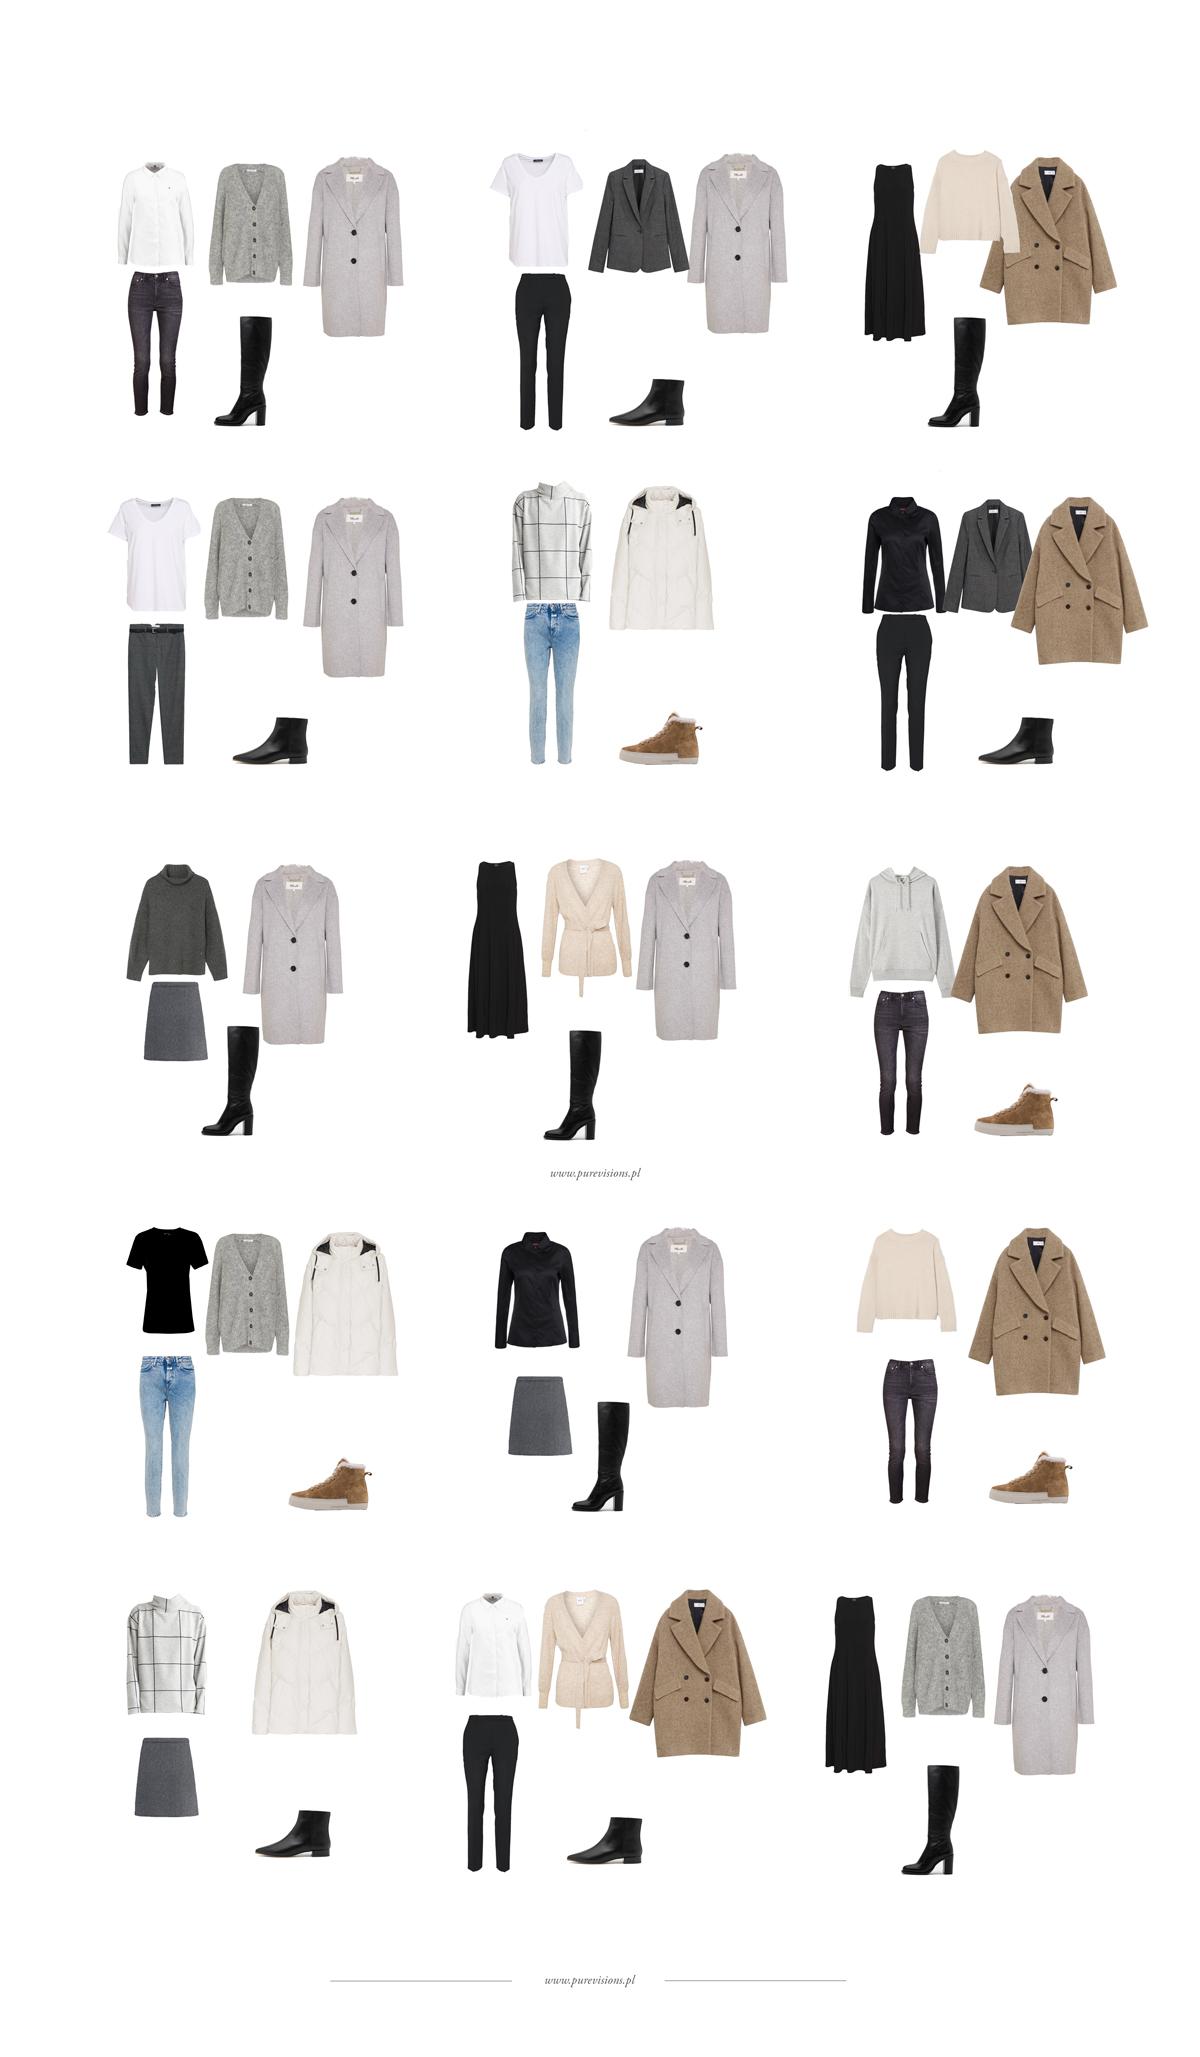 Garderoba kapsułowa na zimę